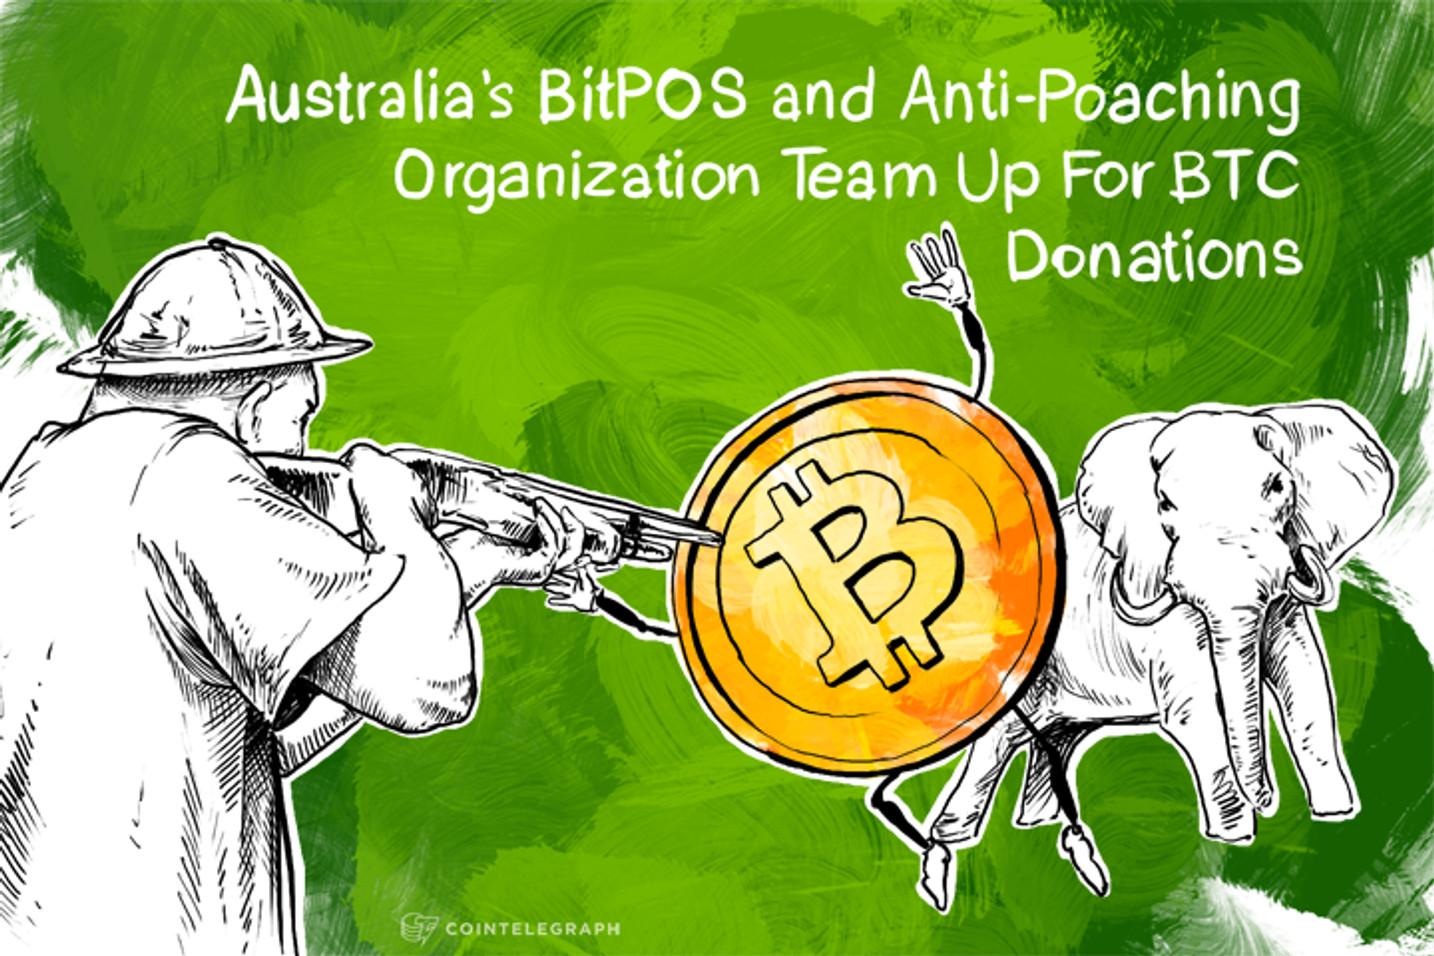 Australia's BitPOS and Anti-Poaching Organization Team Up For BTC Donations